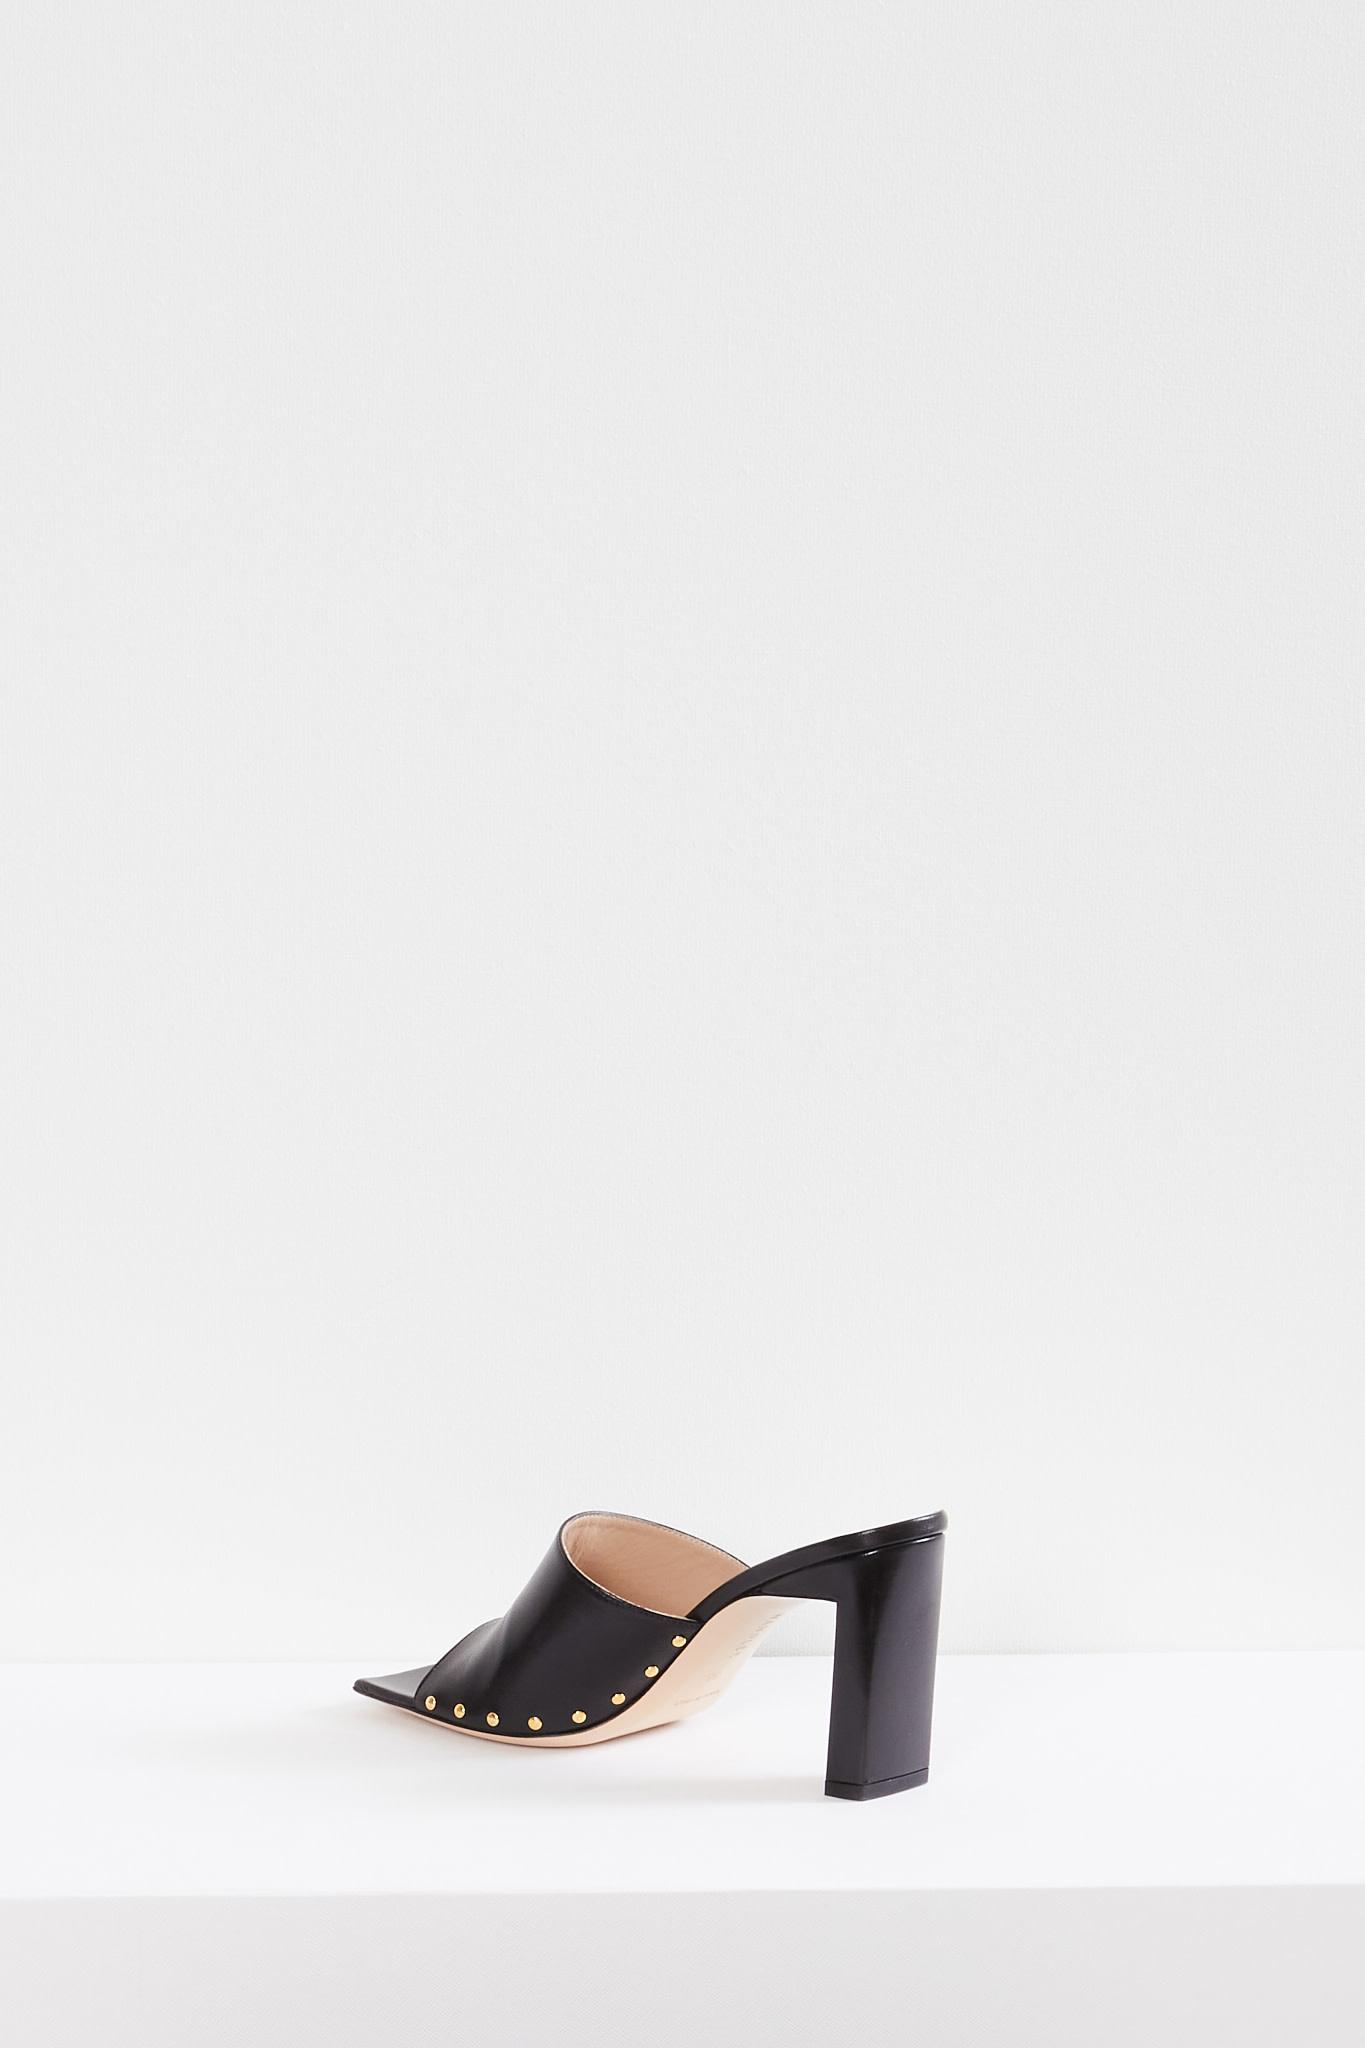 Wandler - Nana mule lambskin leather